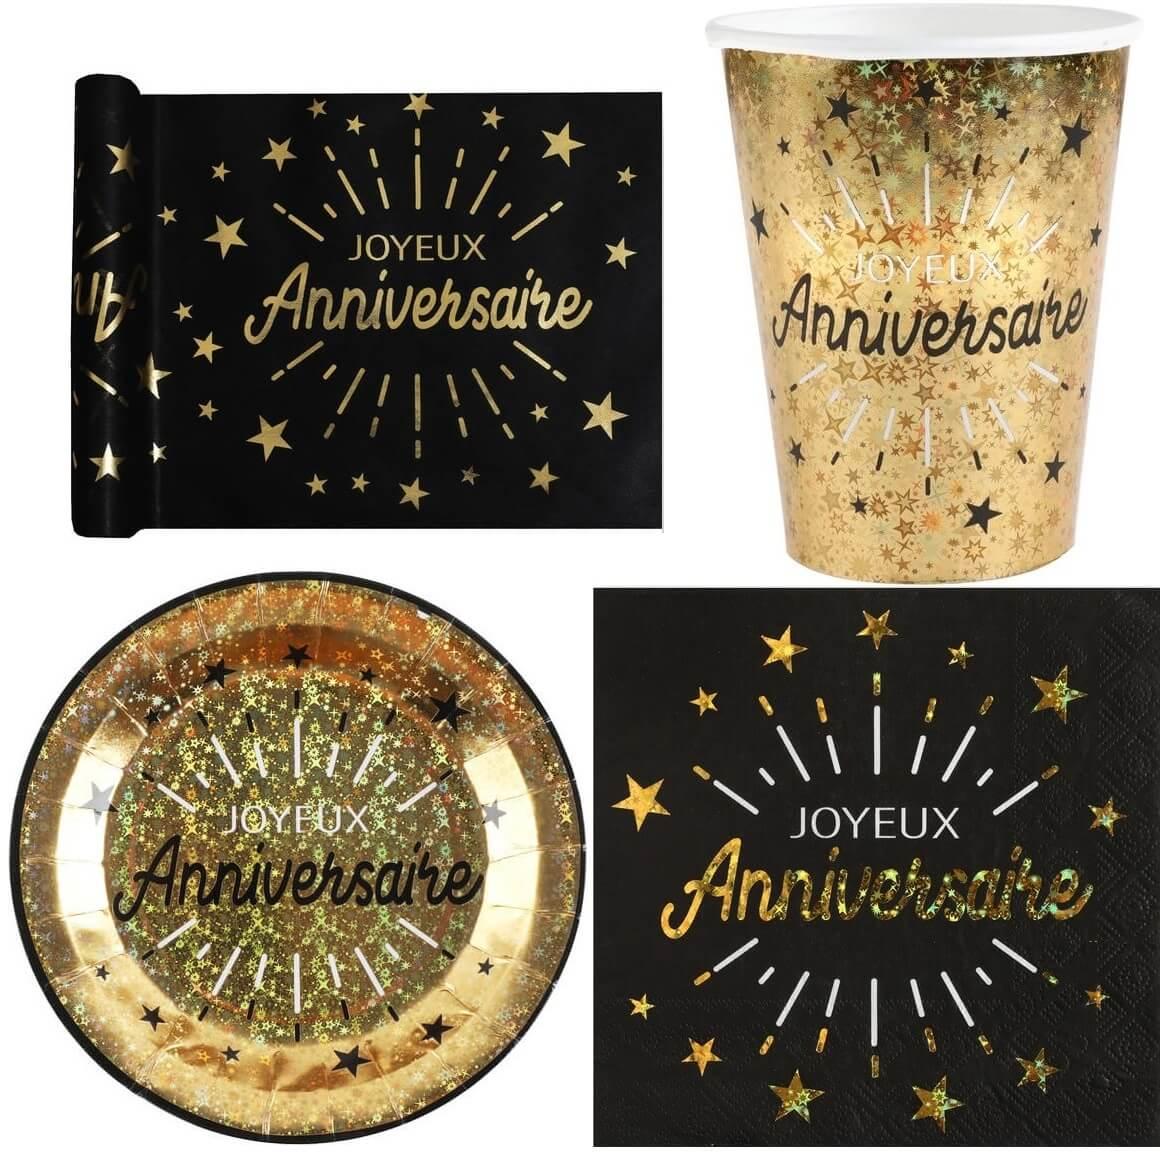 Pack vaisselle jetable joyeux anniversaire noir et or metallise